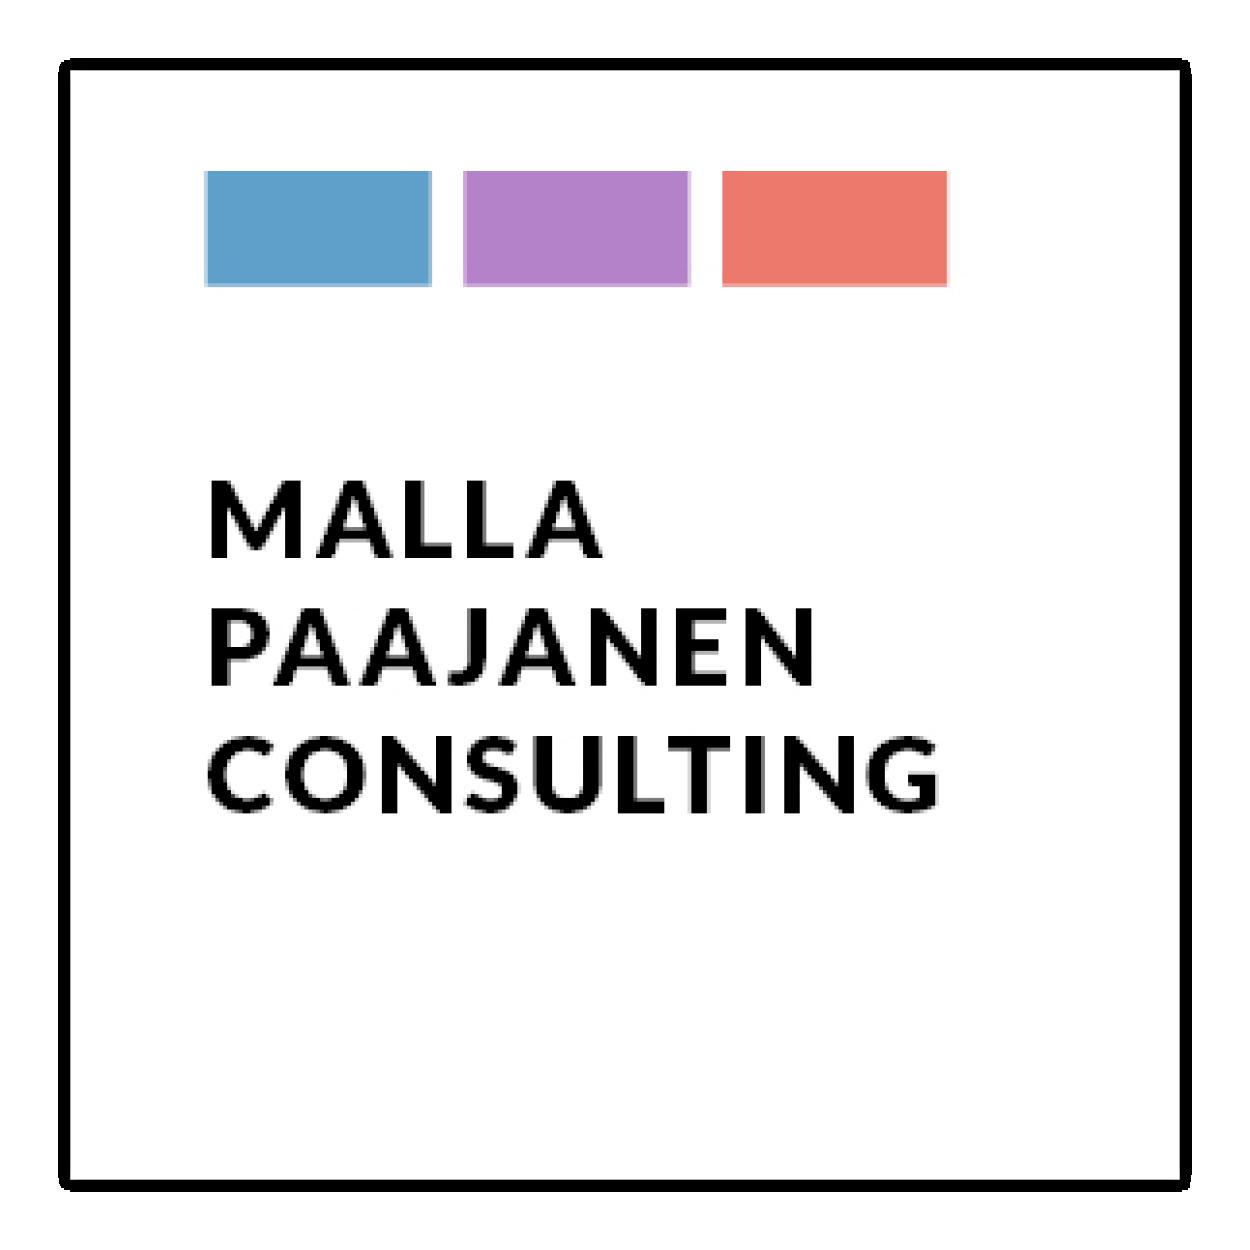 www_logo2.png